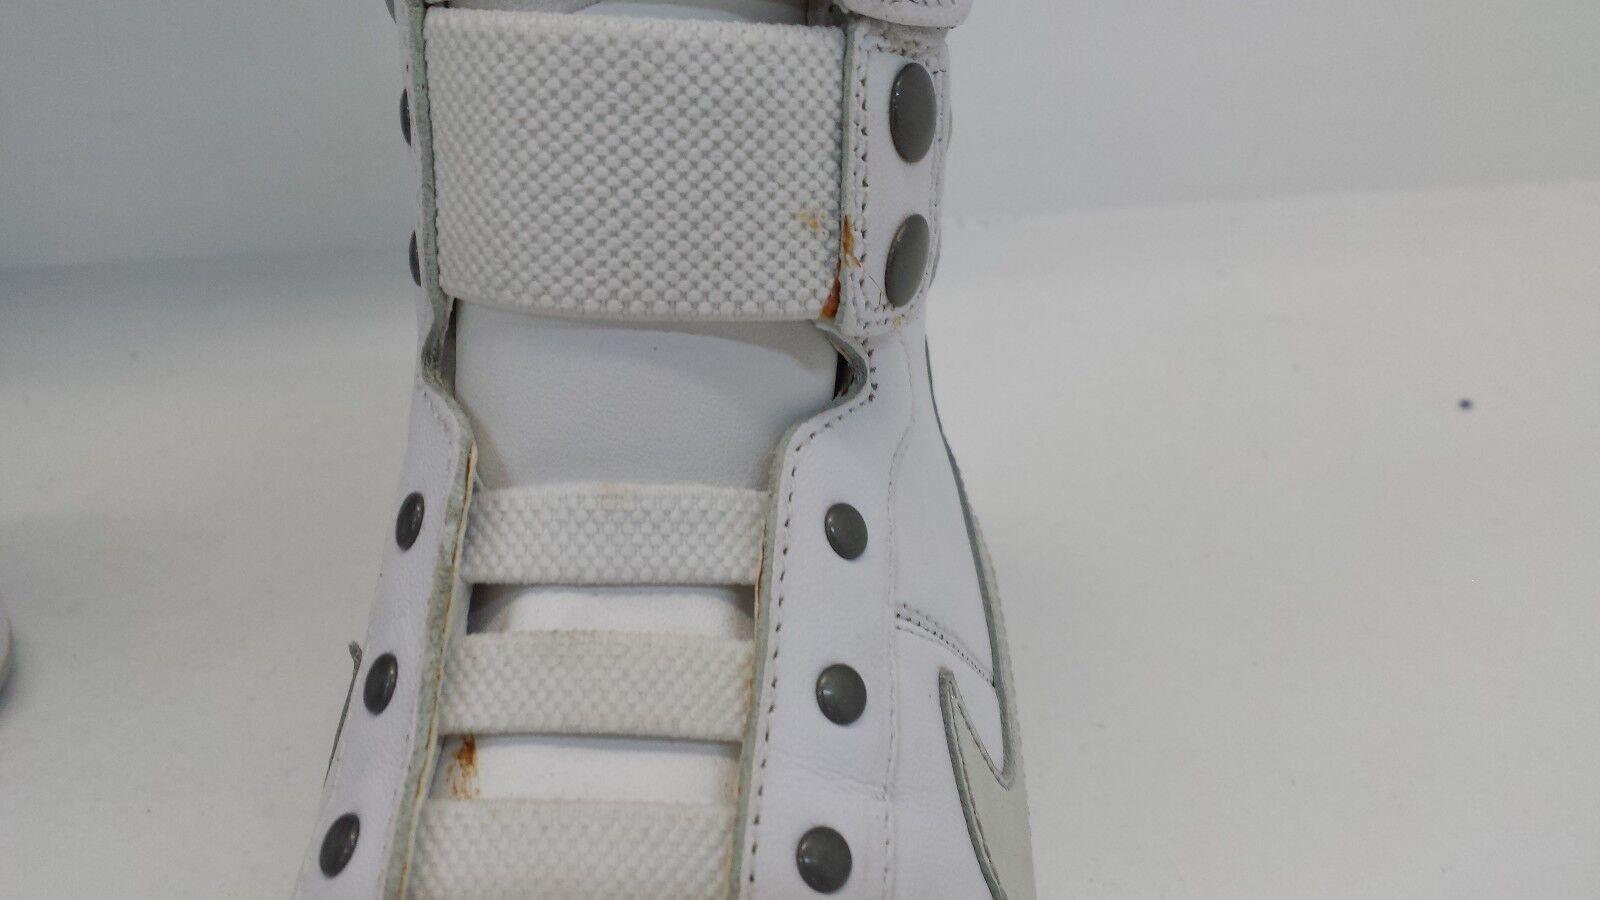 Nike WOMEN'S Gamma Mid Wht/Metallic Silver Size 101 6.5 414824 101 Size (DISCOLORED) f46d8a